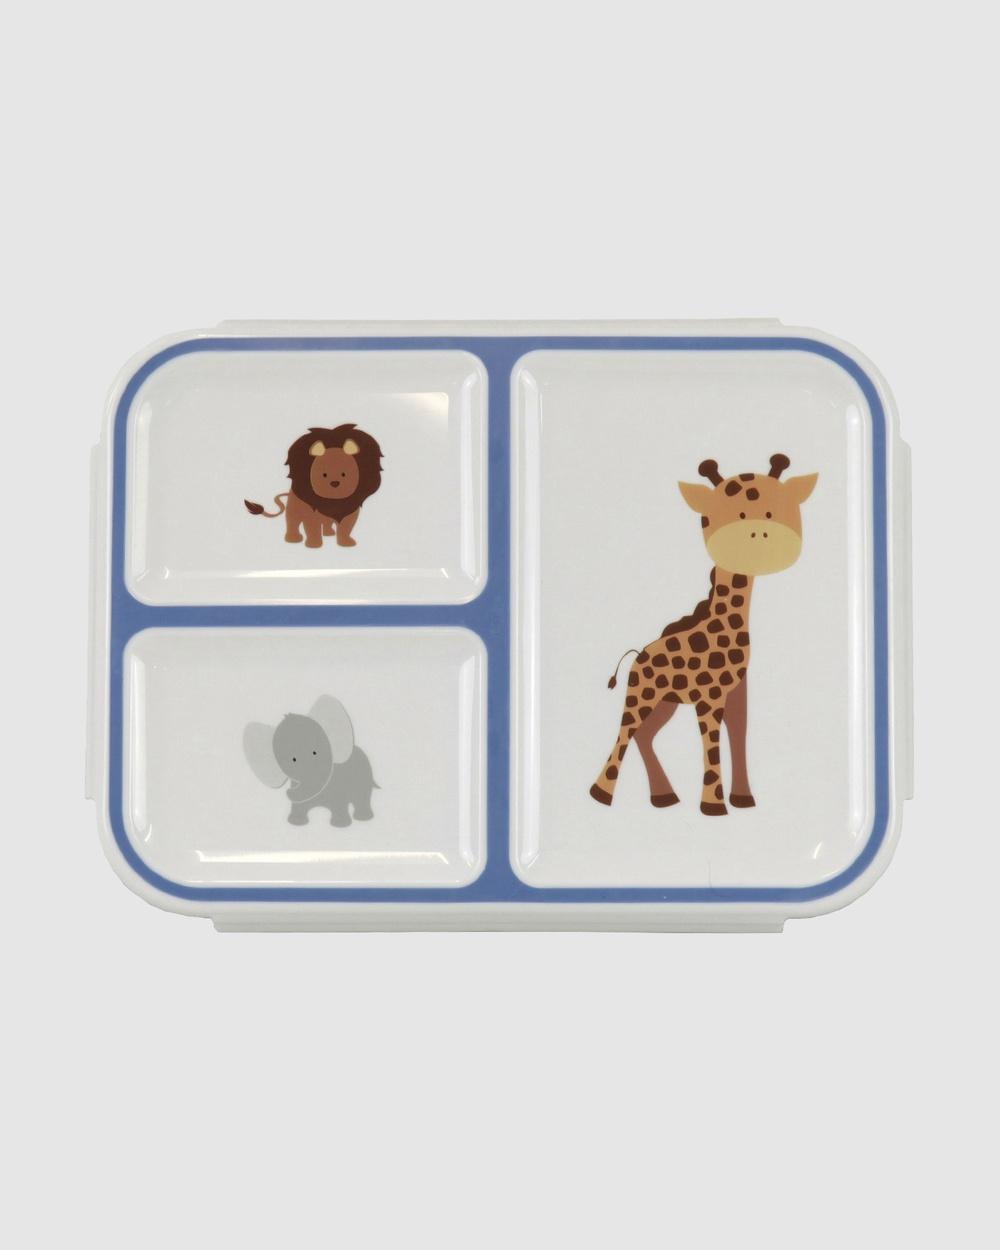 Bobbleart Bento Box Safari Novelty Gifts Blue